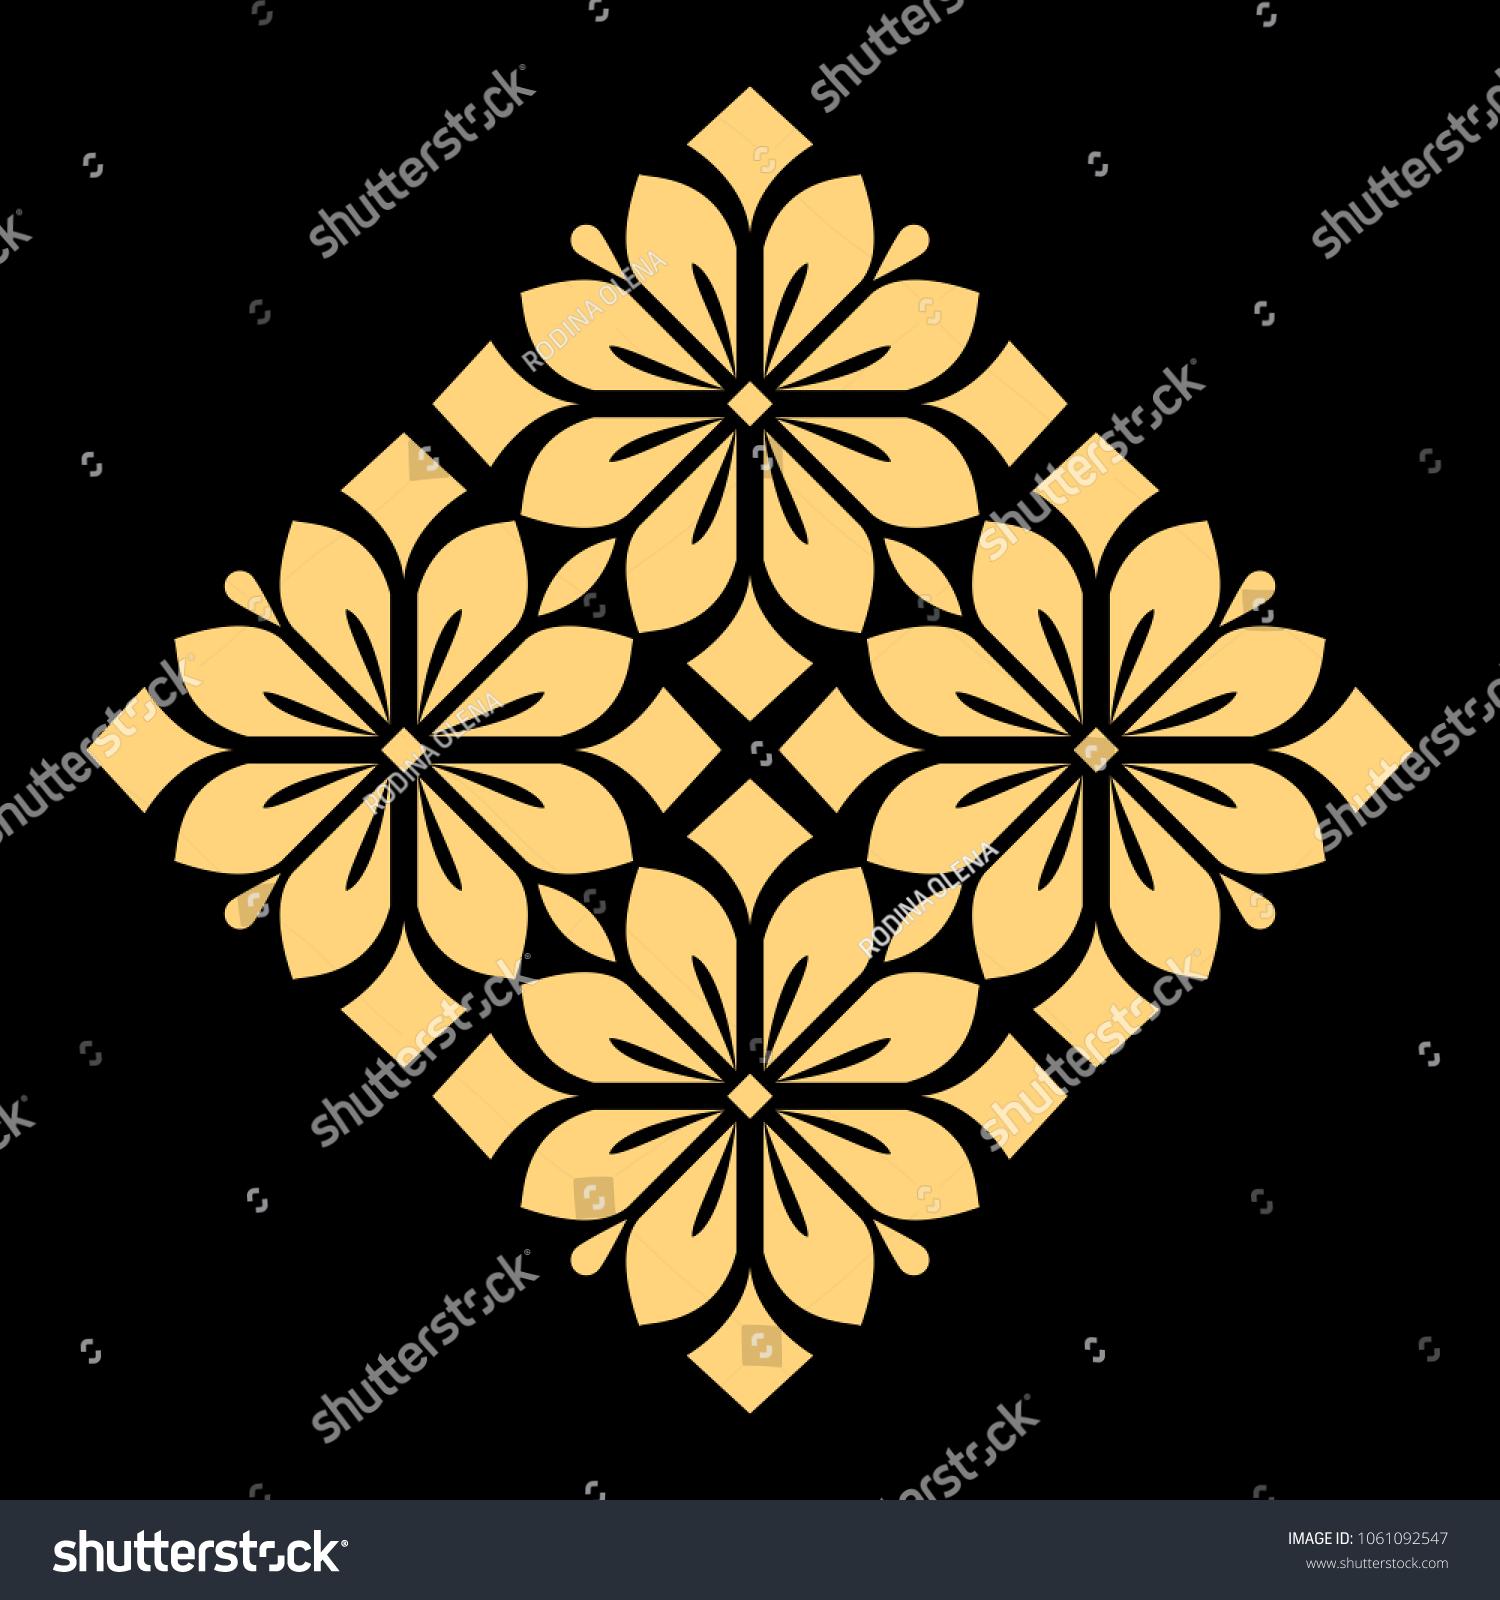 Golden Pattern On Black Background Damask Stock Illustration 1061092547